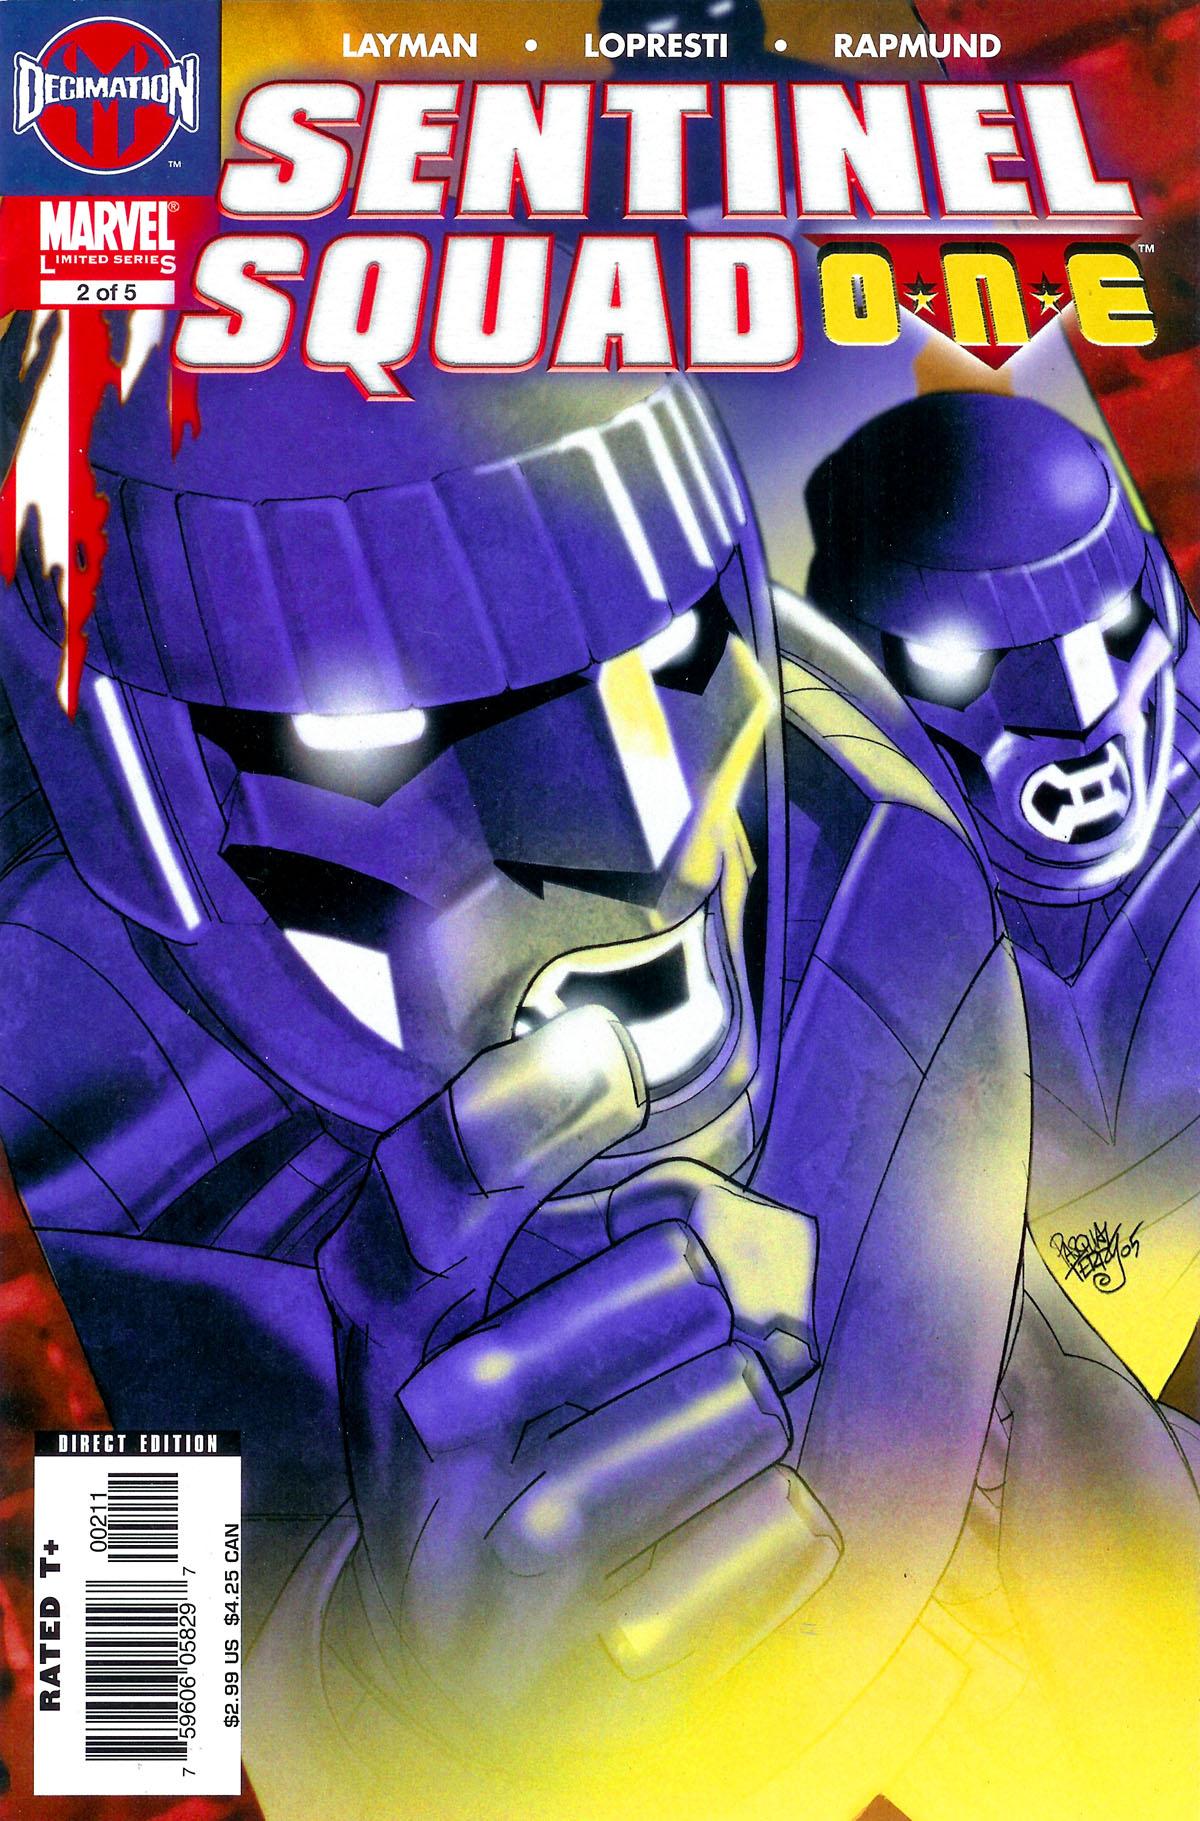 Read online Sentinel Squad O*N*E comic -  Issue #2 - 1